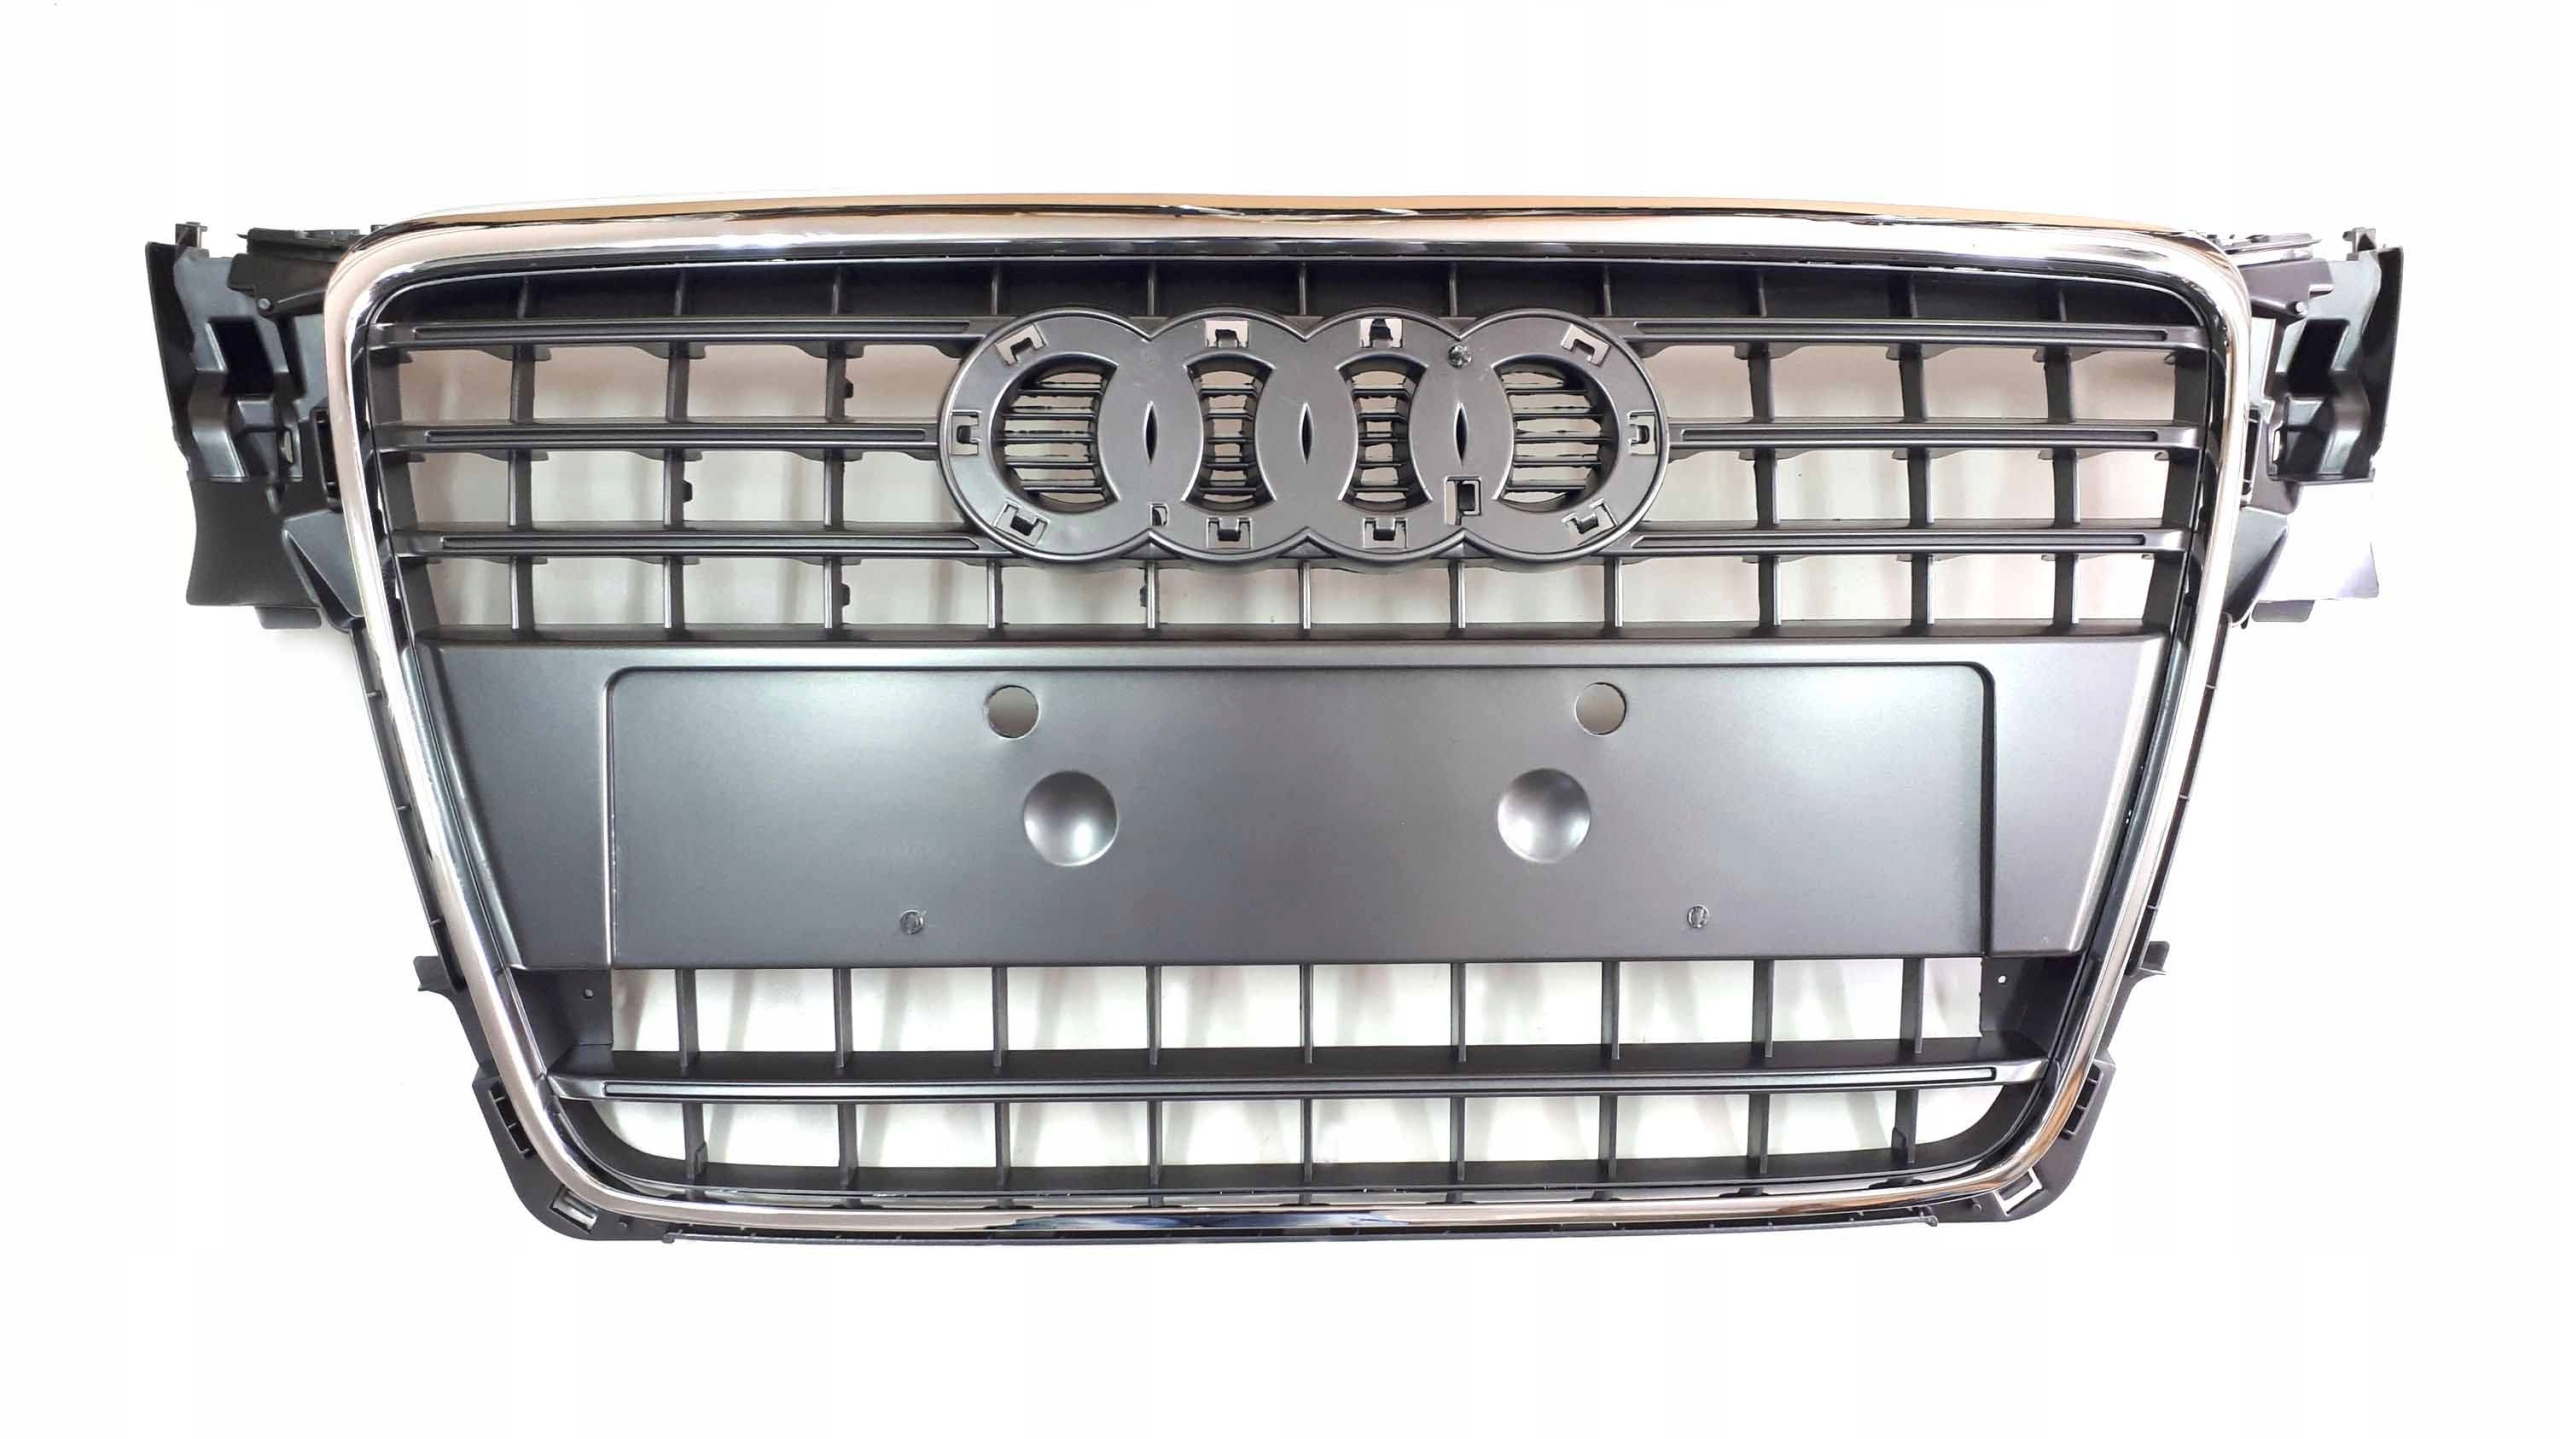 Ön Panjur - Audi A4 - 2008 - 2012 - 8K0853651